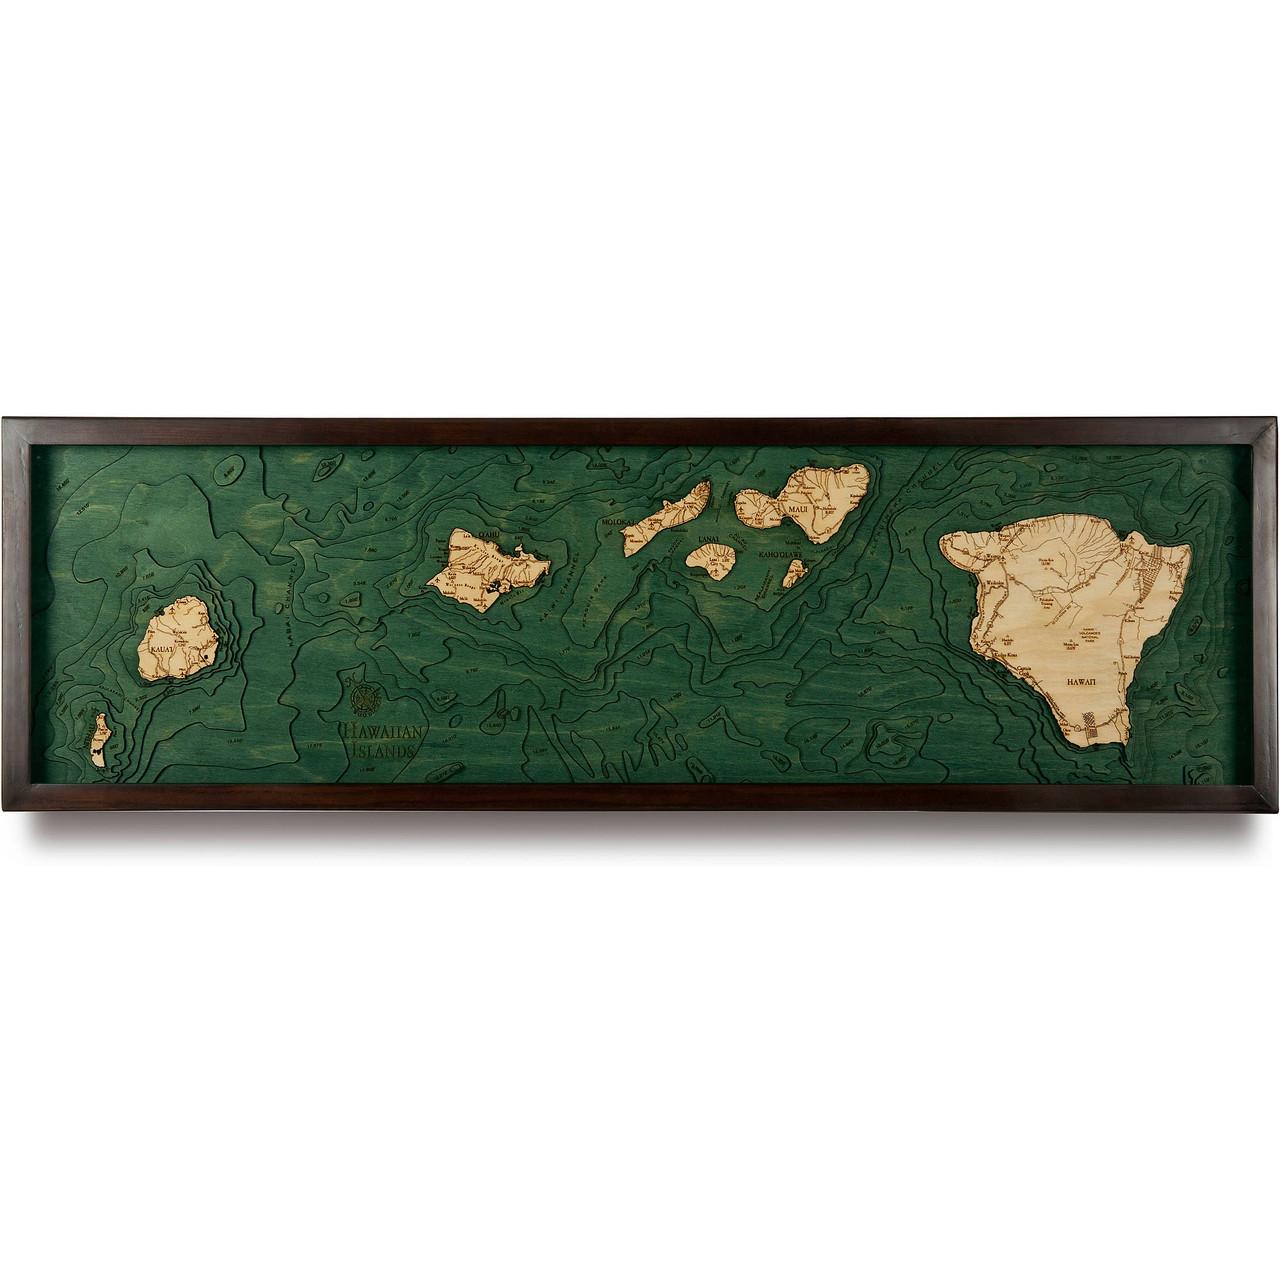 Hawaiian Islands Wooden Map Art Topographic 3d Chart